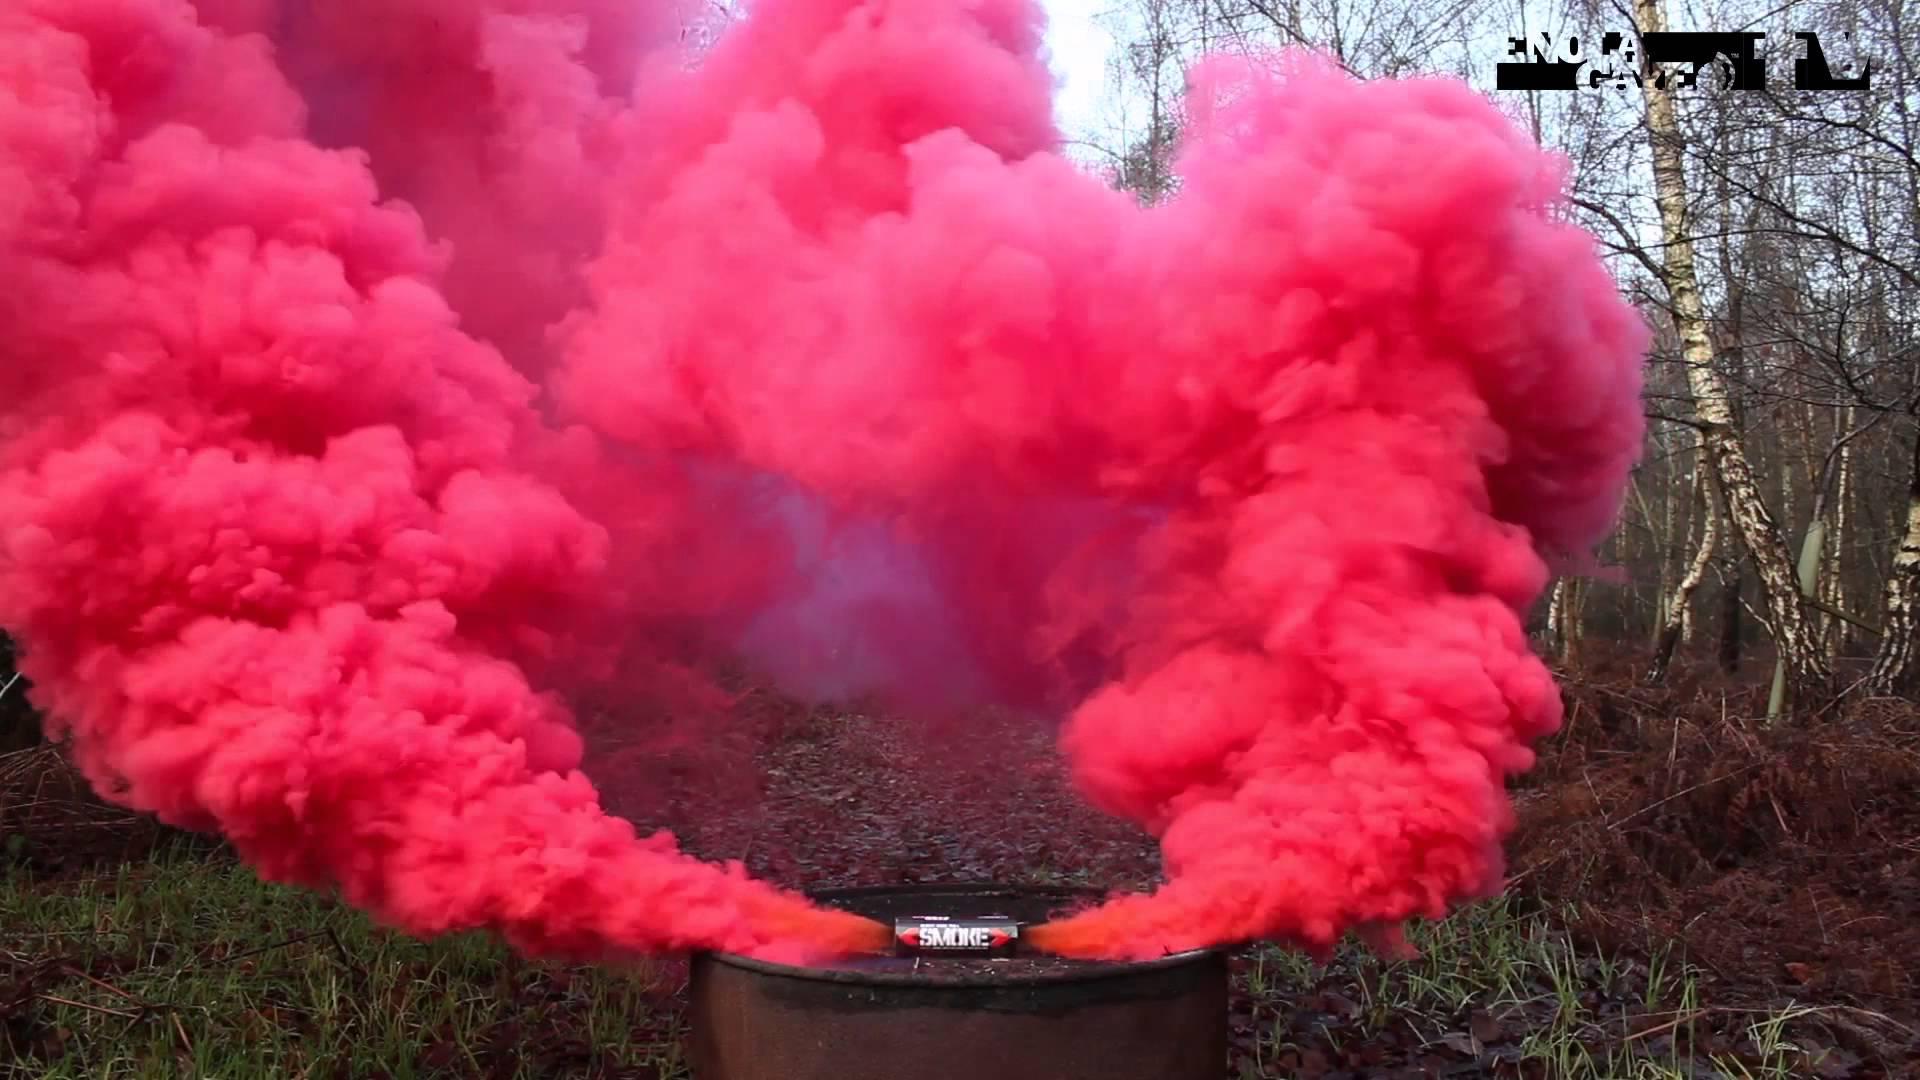 Bom Smoke Background Asap Warna Warni - Mino Gambar